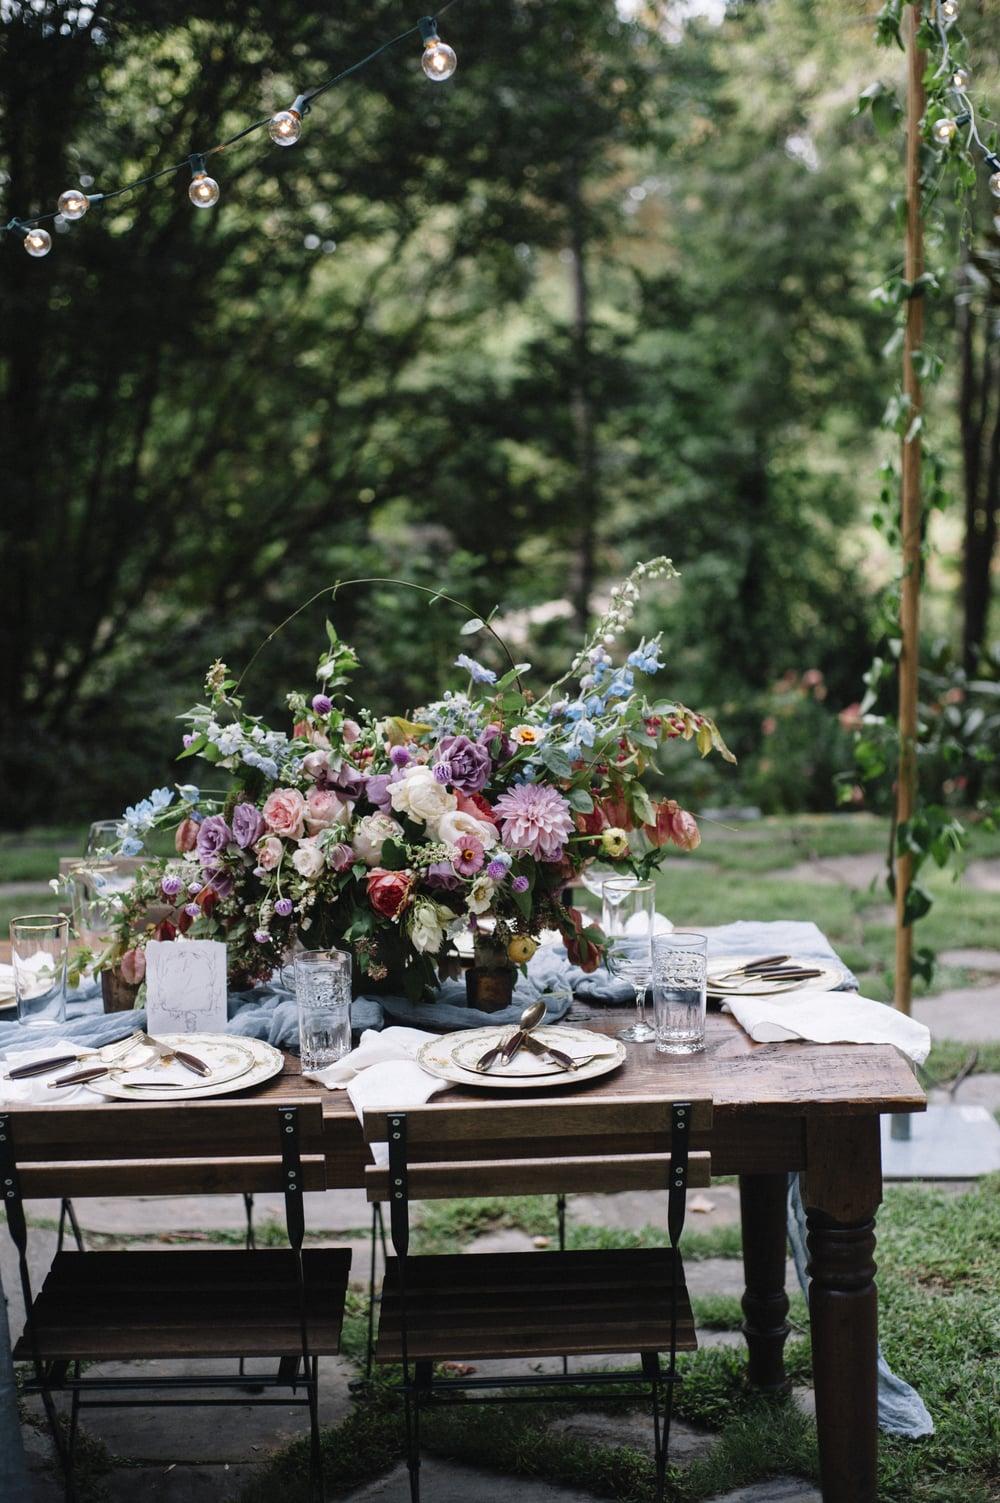 amy-osaba-events-flower-workshop-katie-hyatt-blue-dress-pink-flowers-bouquet45.jpg